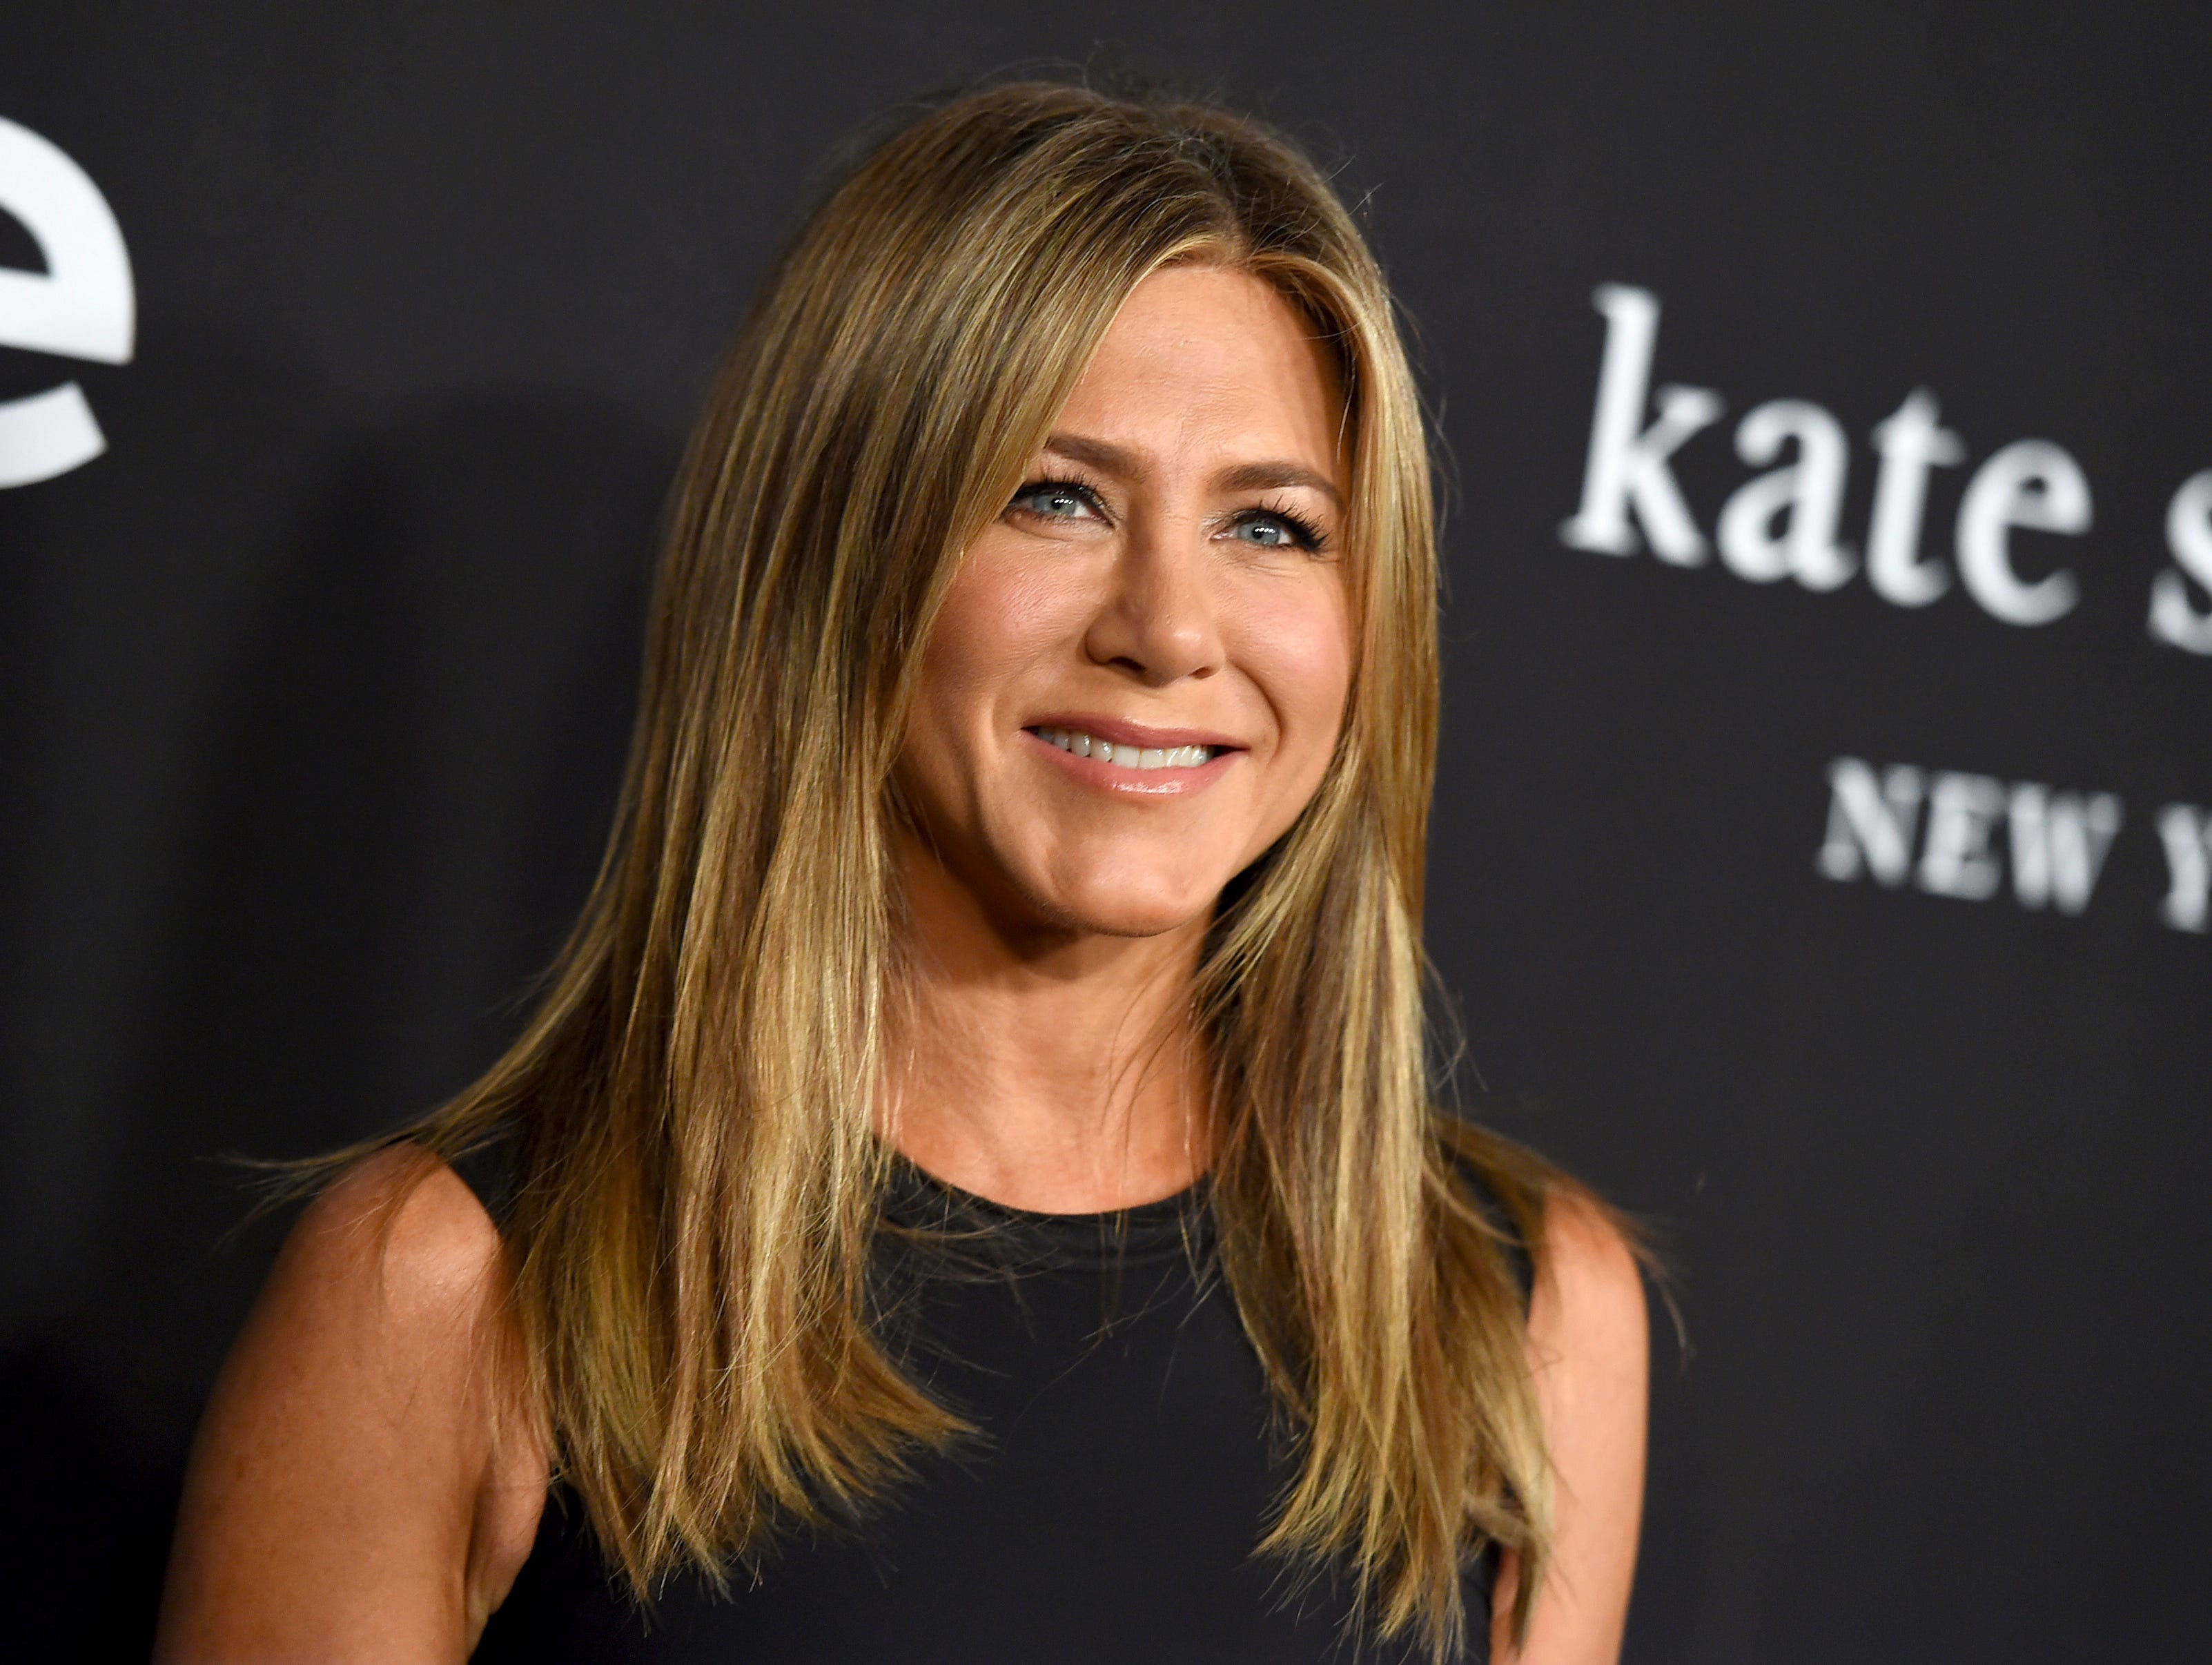 Hear Jennifer Aniston's Southern accent as a former pageant queen in Netflix's 'Dumplin''